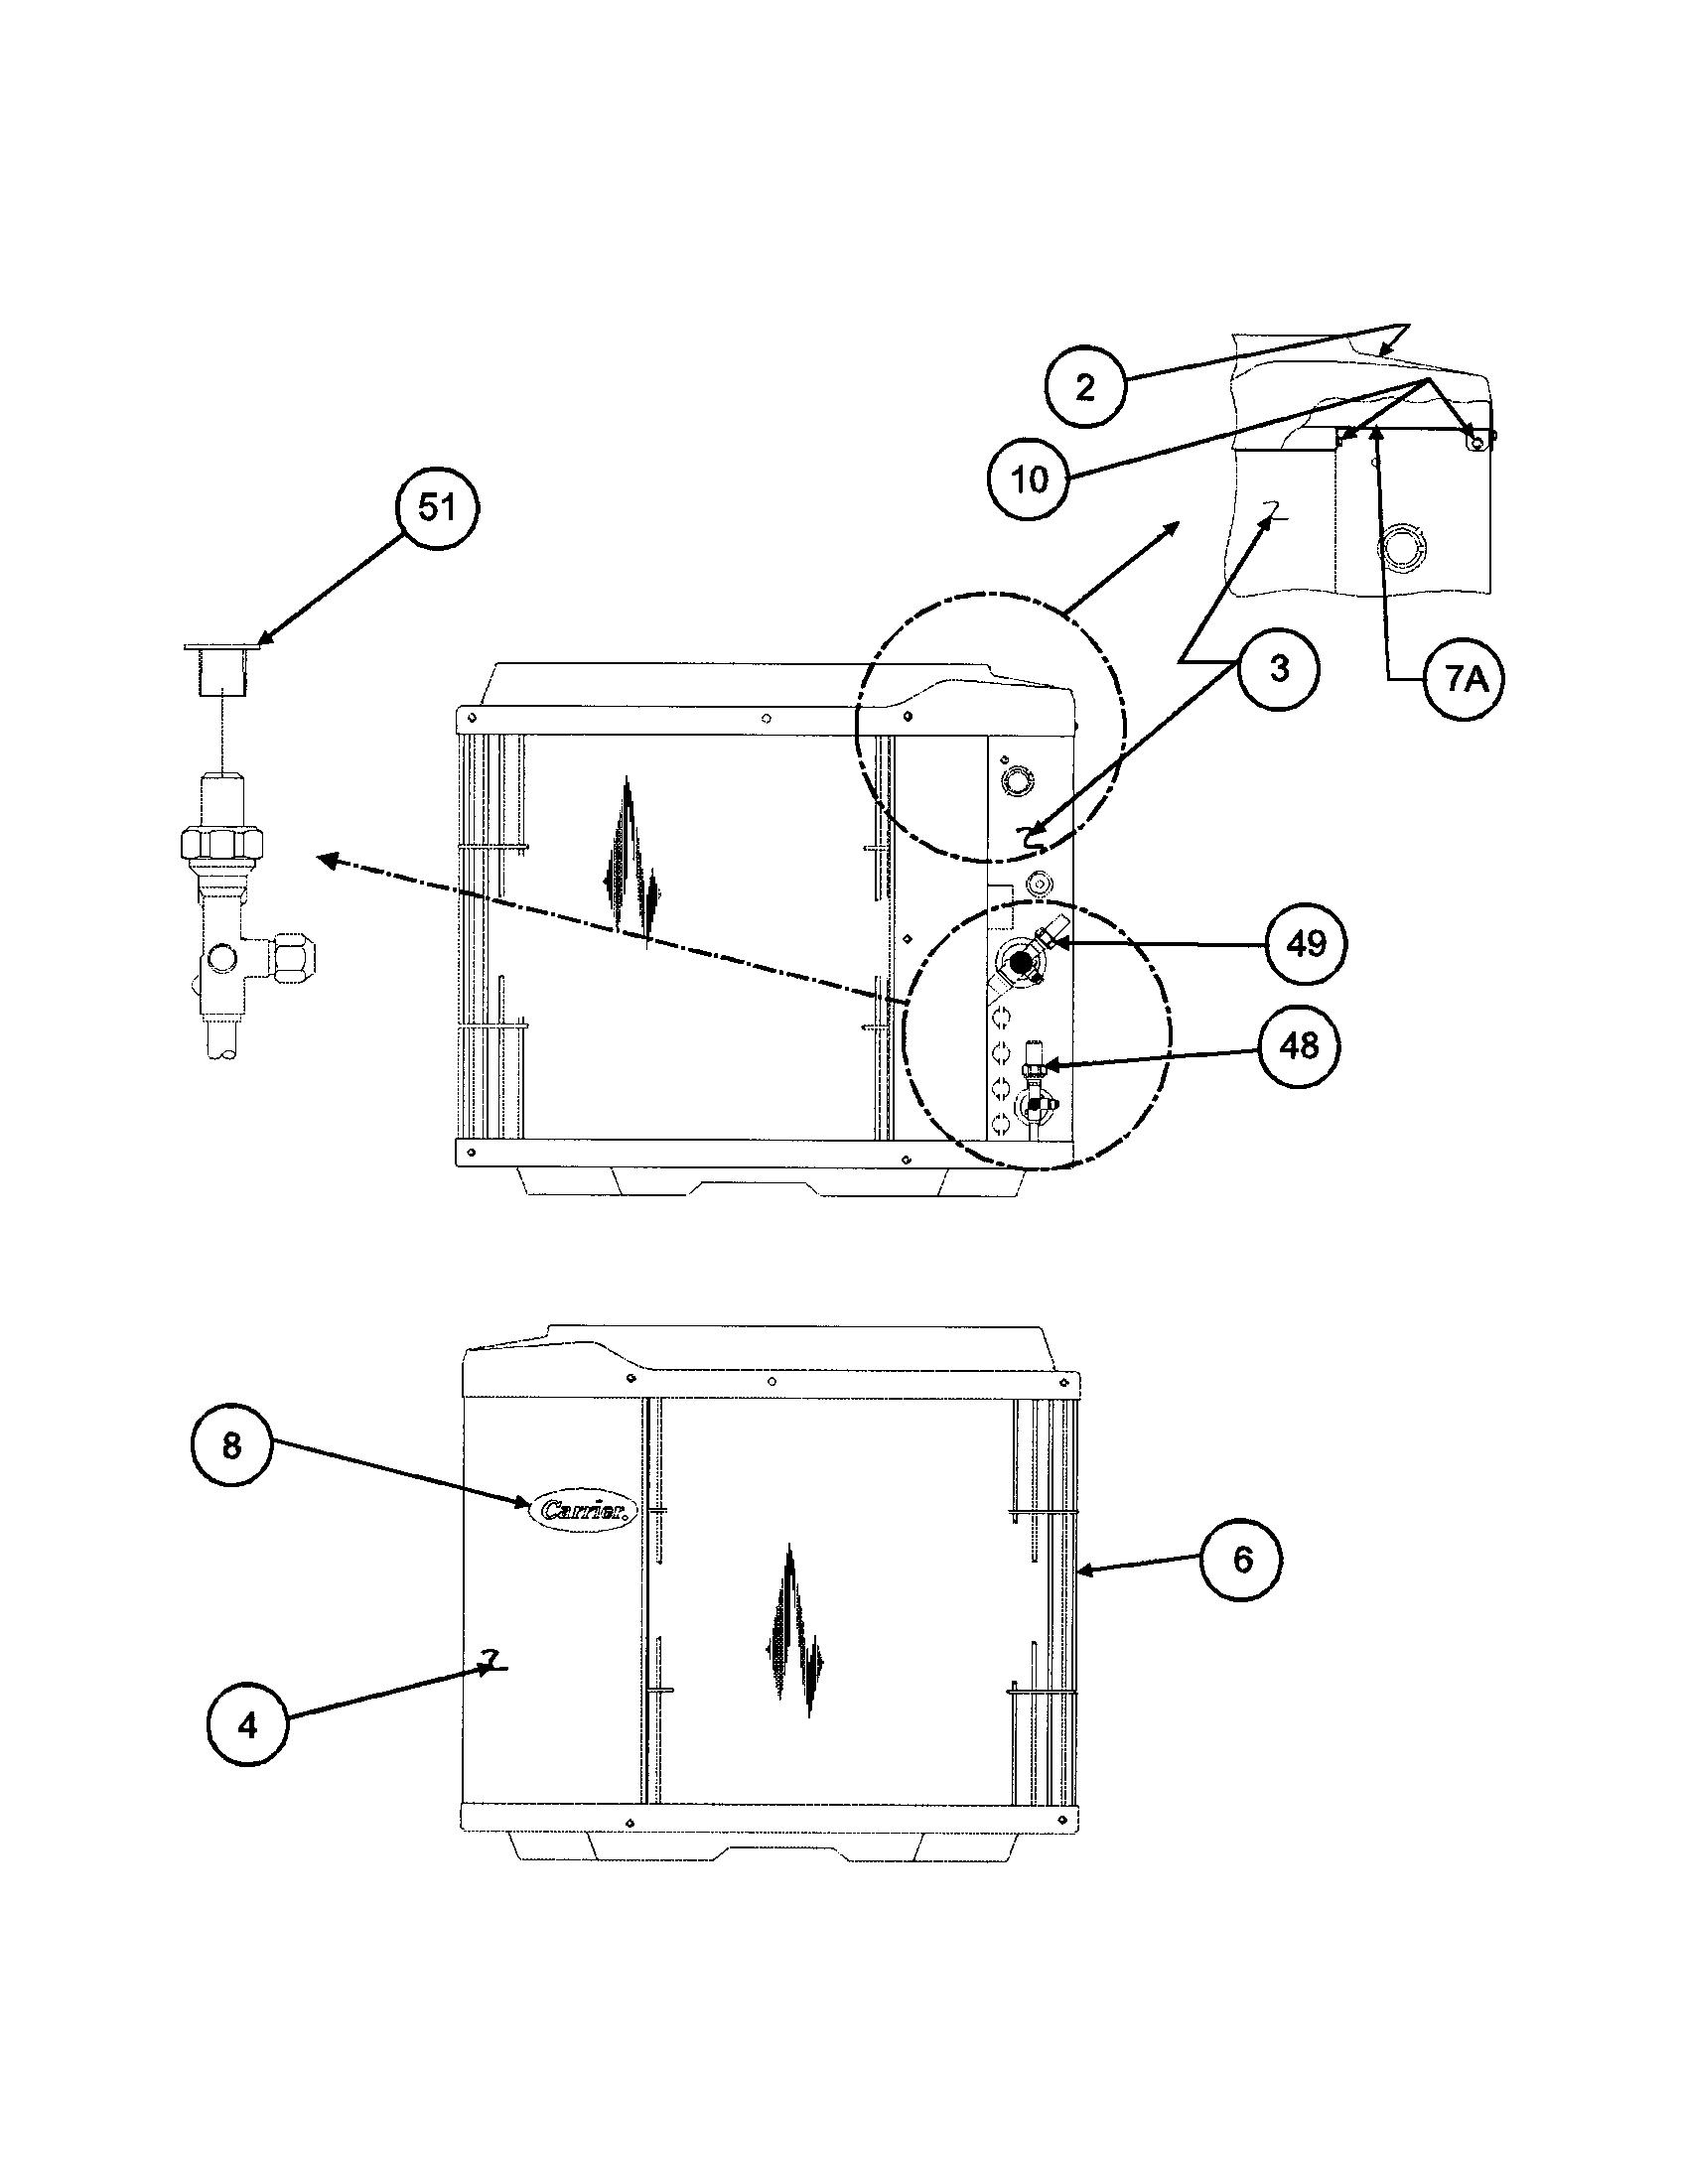 Carrier model 38TXA042 SERIES330 air-conditioner/heat pump